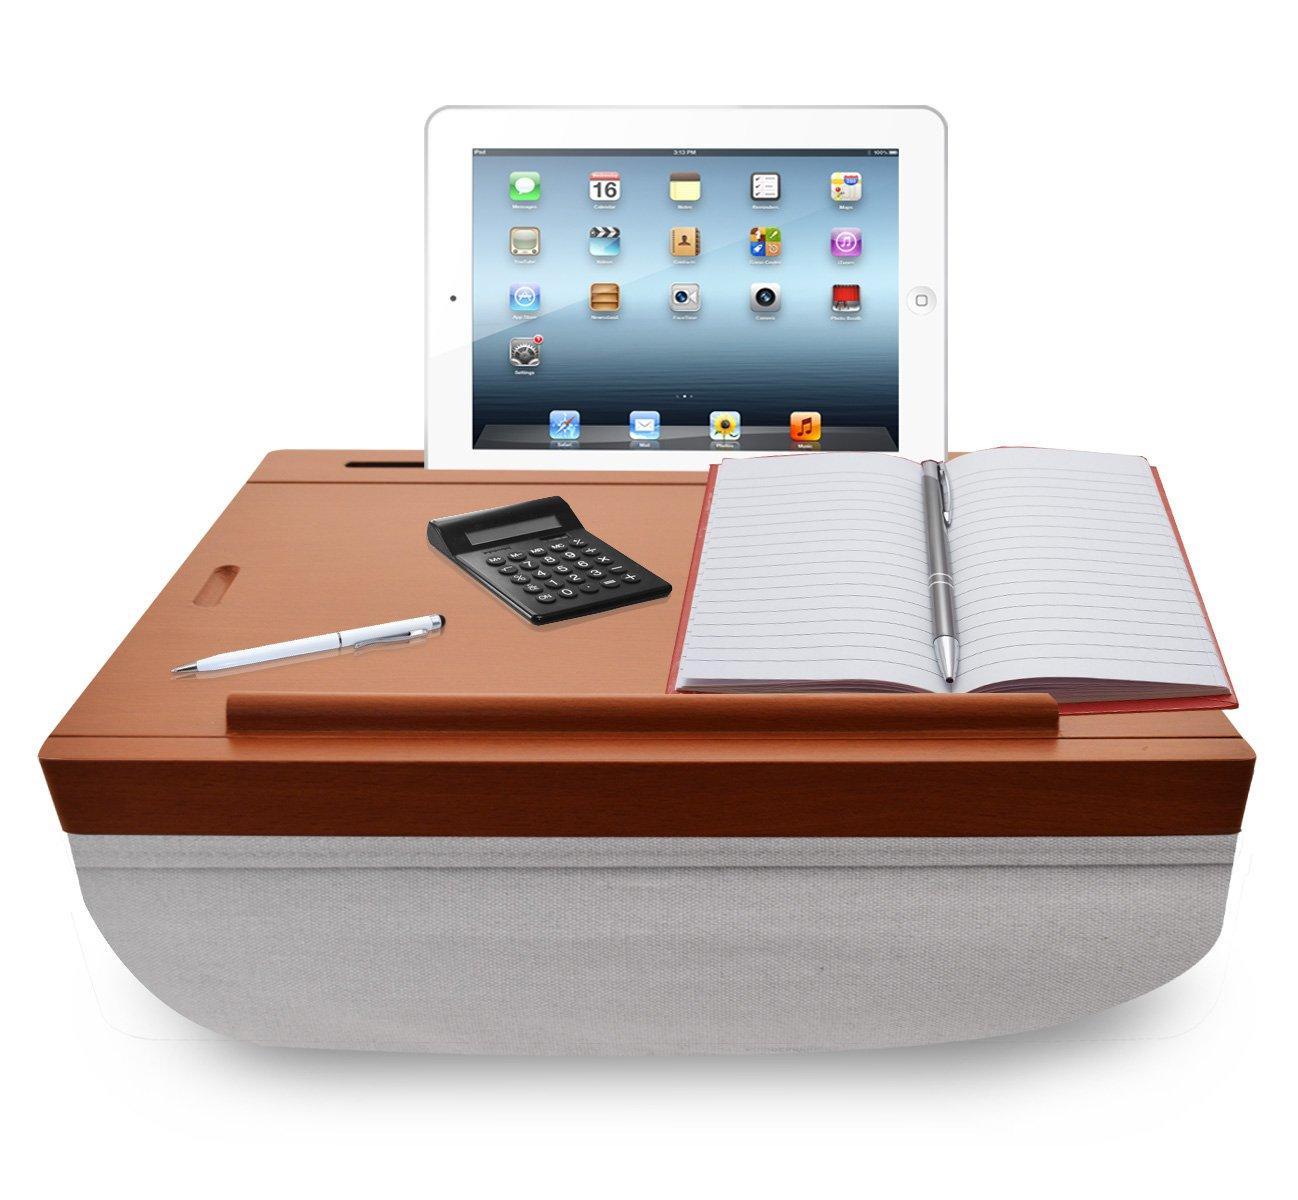 iCozy Portable Cushion Lap Desk With Storage - Wood-Look w / Light Grey